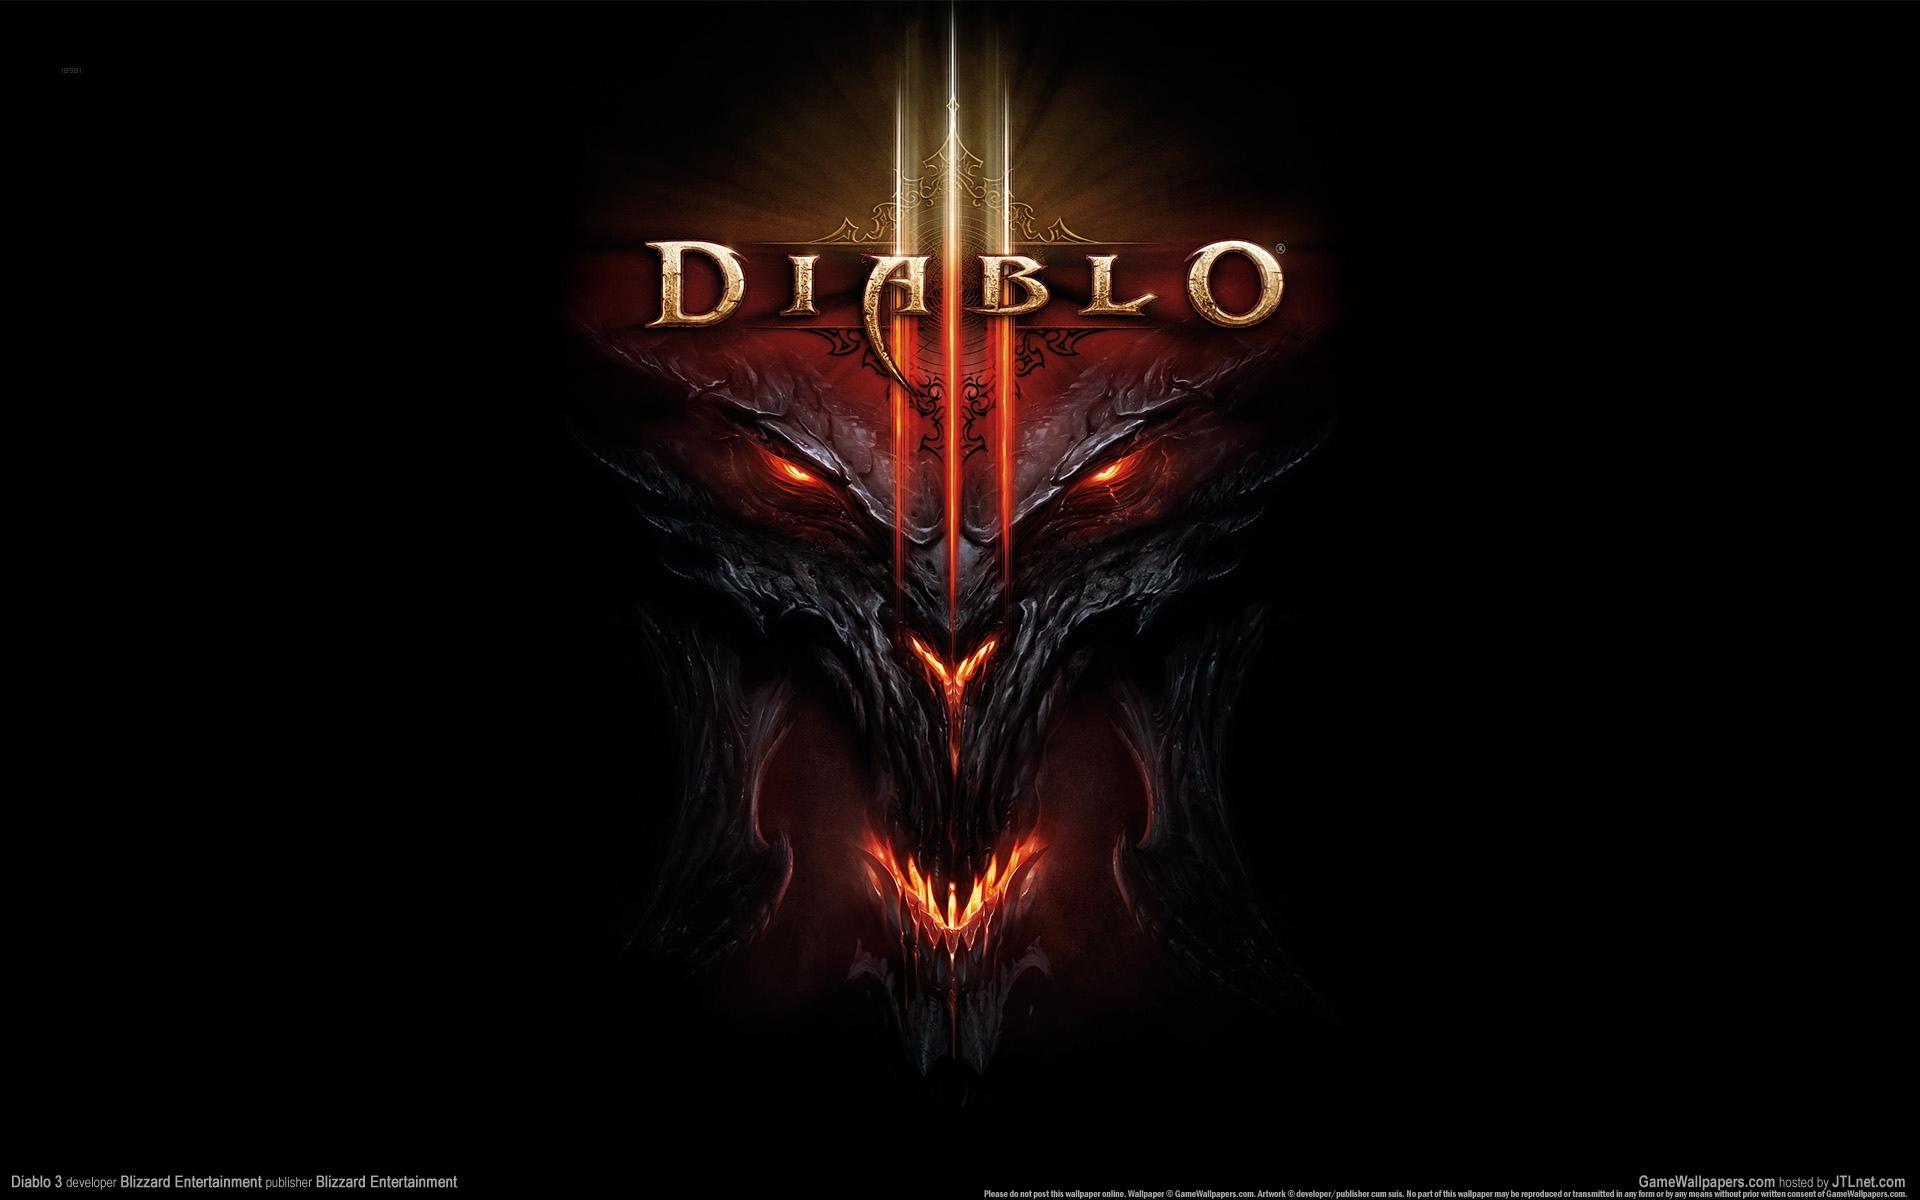 Diablo hd wallpapers widescreen 1920x1200 thecheapjerseys Choice Image